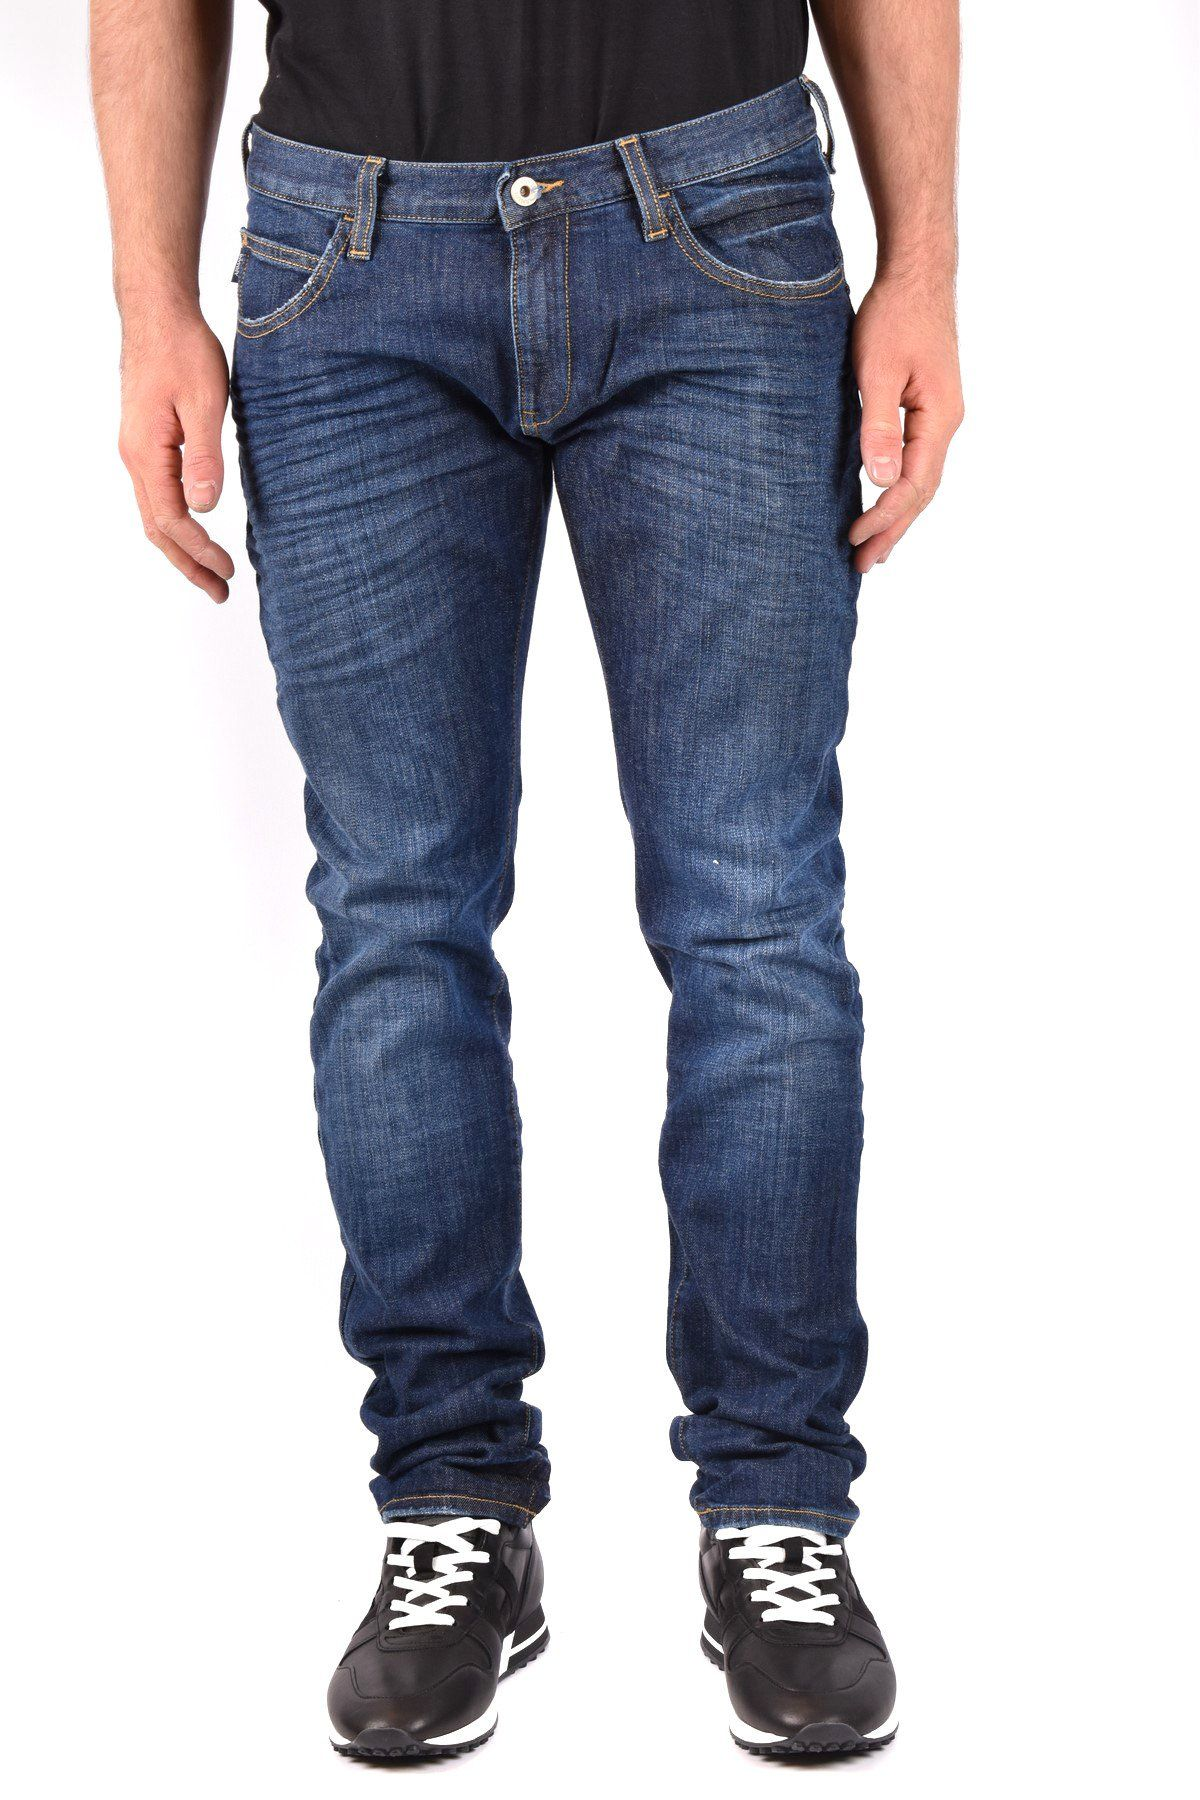 Armani Jeans Men's Jeans In Blue